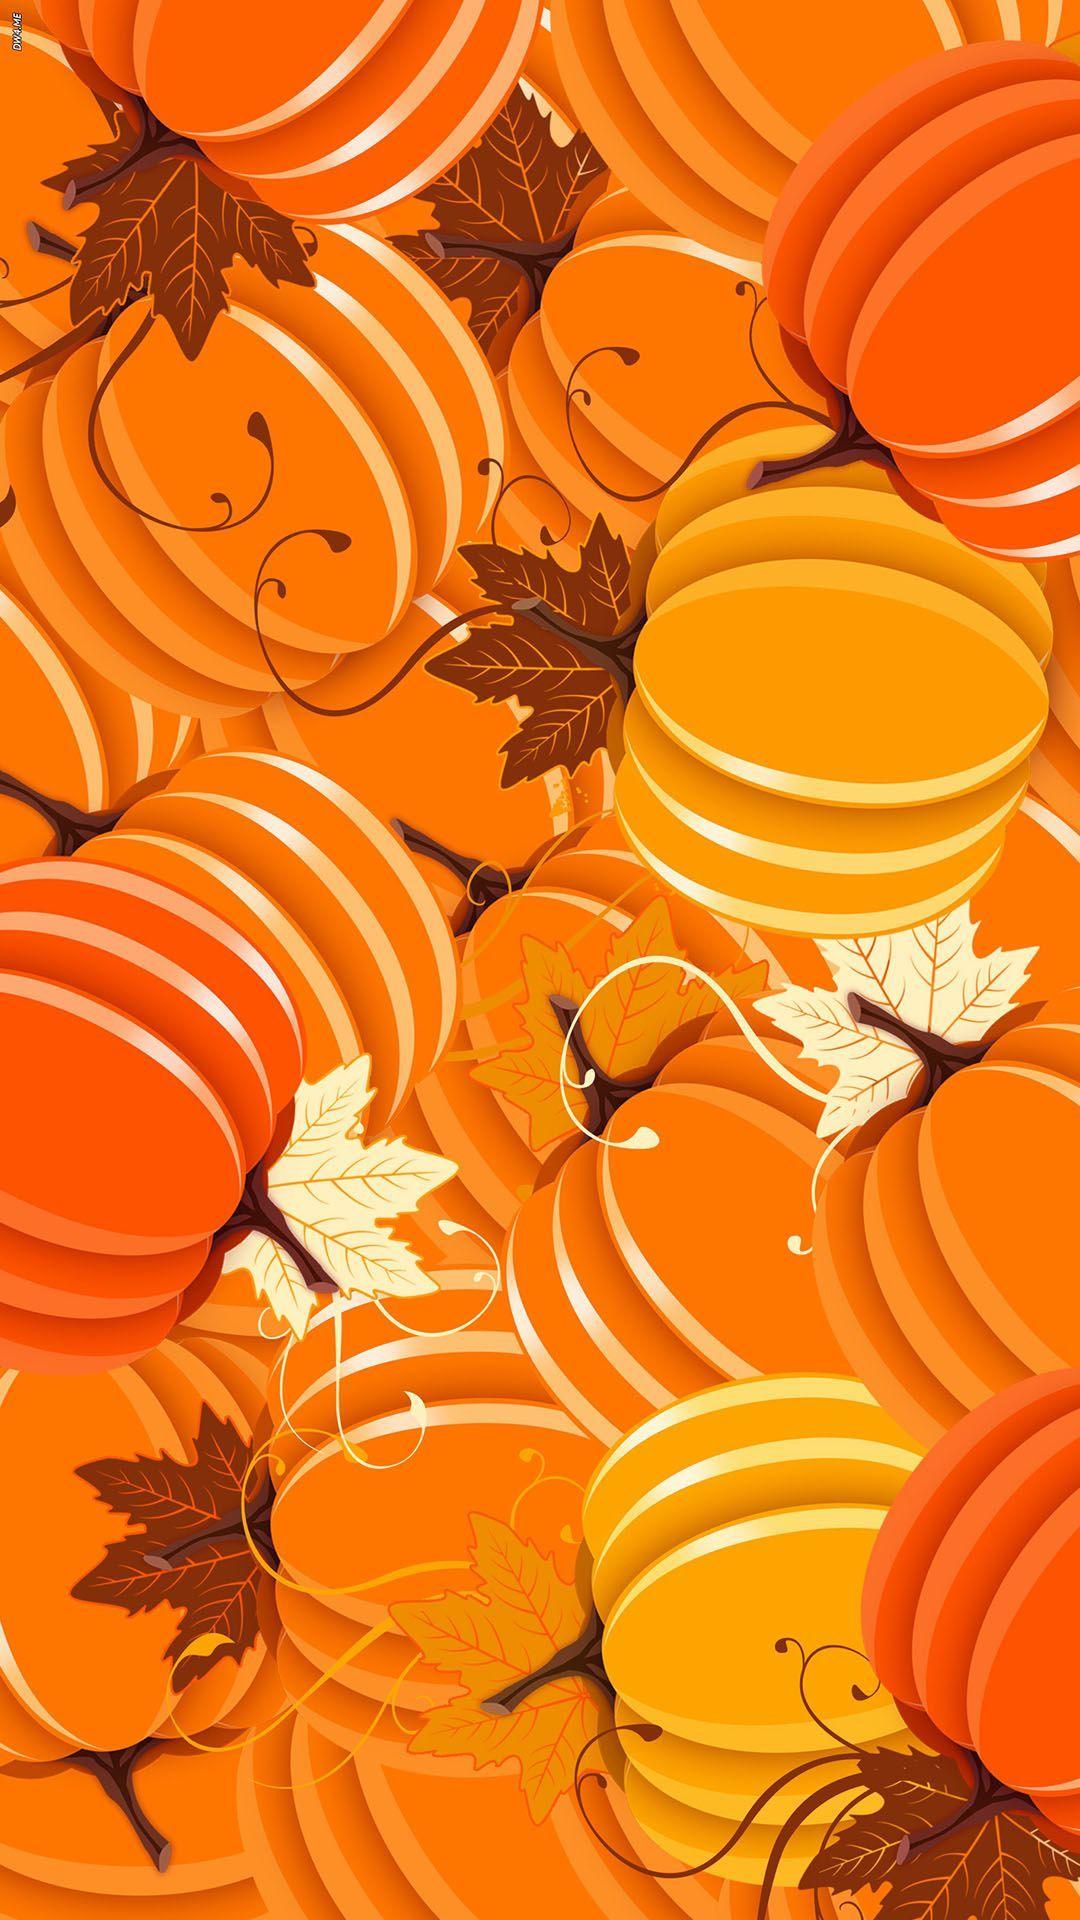 Girly Autumn Wallpaper #girly #autumn #Wallpaper #Iphone ...